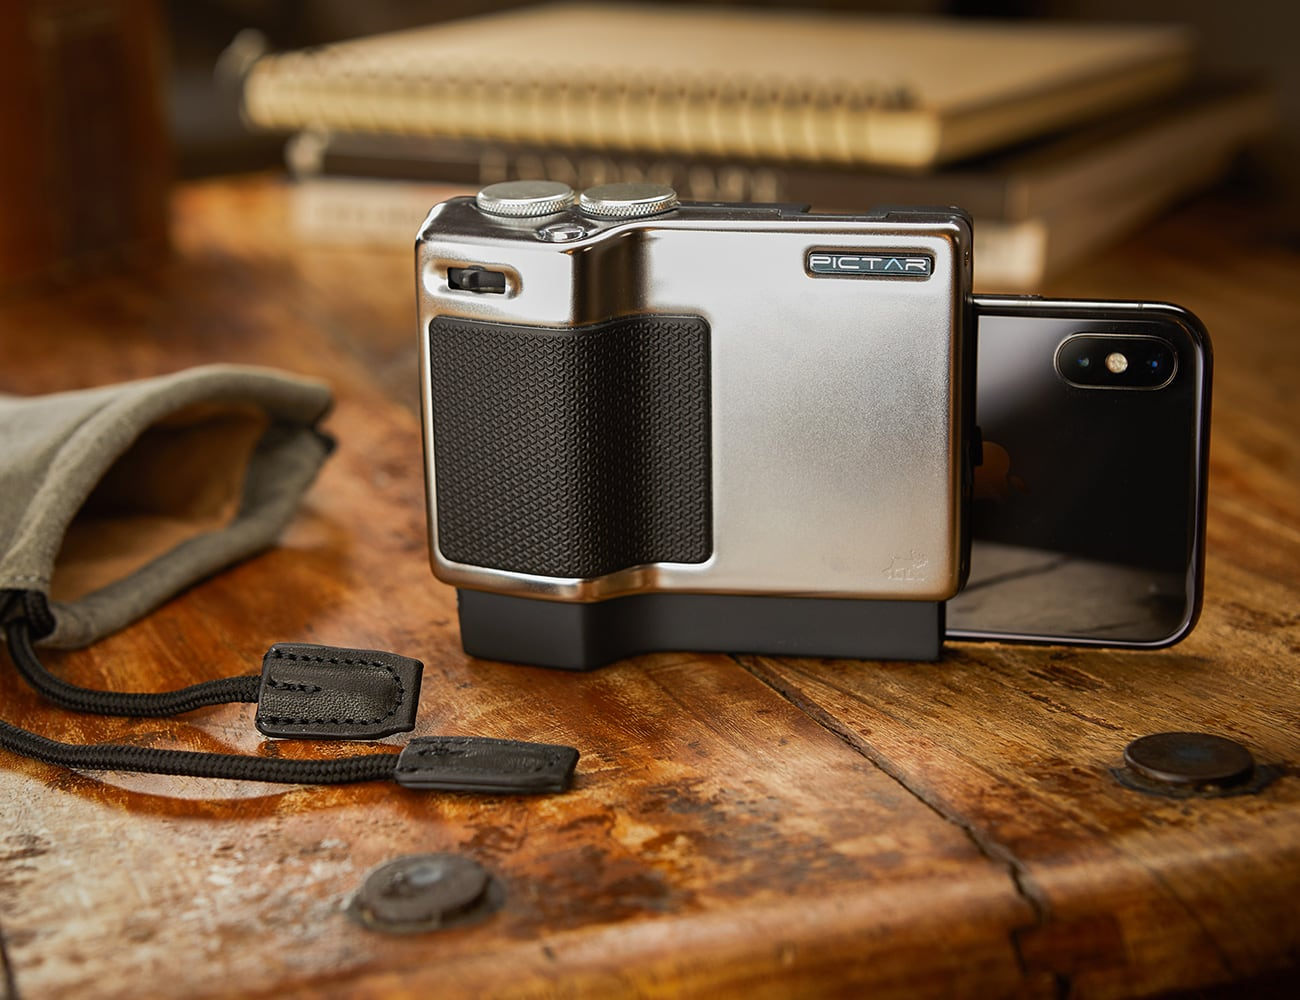 Pictar Pro Smartphone DSLR Grip